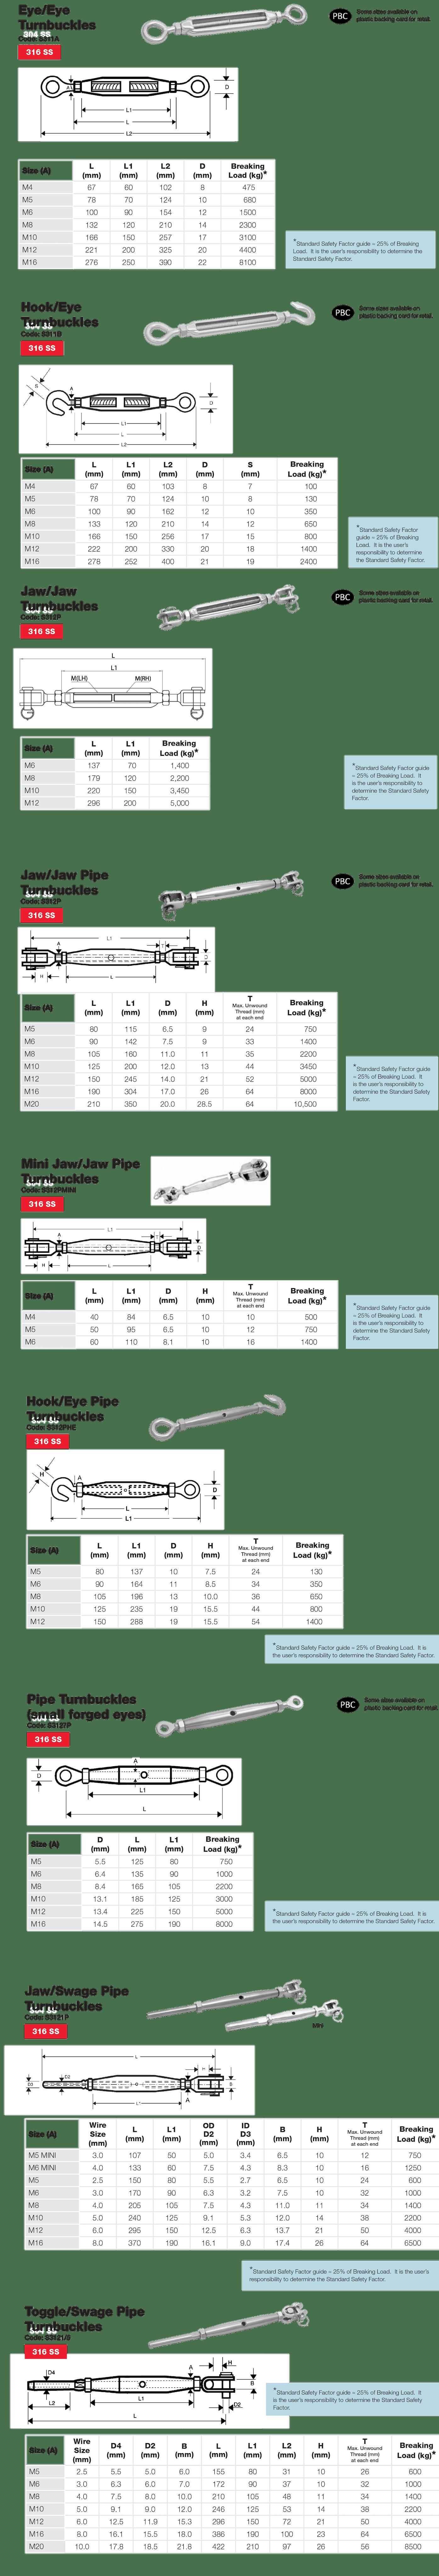 Stainless Steel Marine Turnbuckle Dimensions